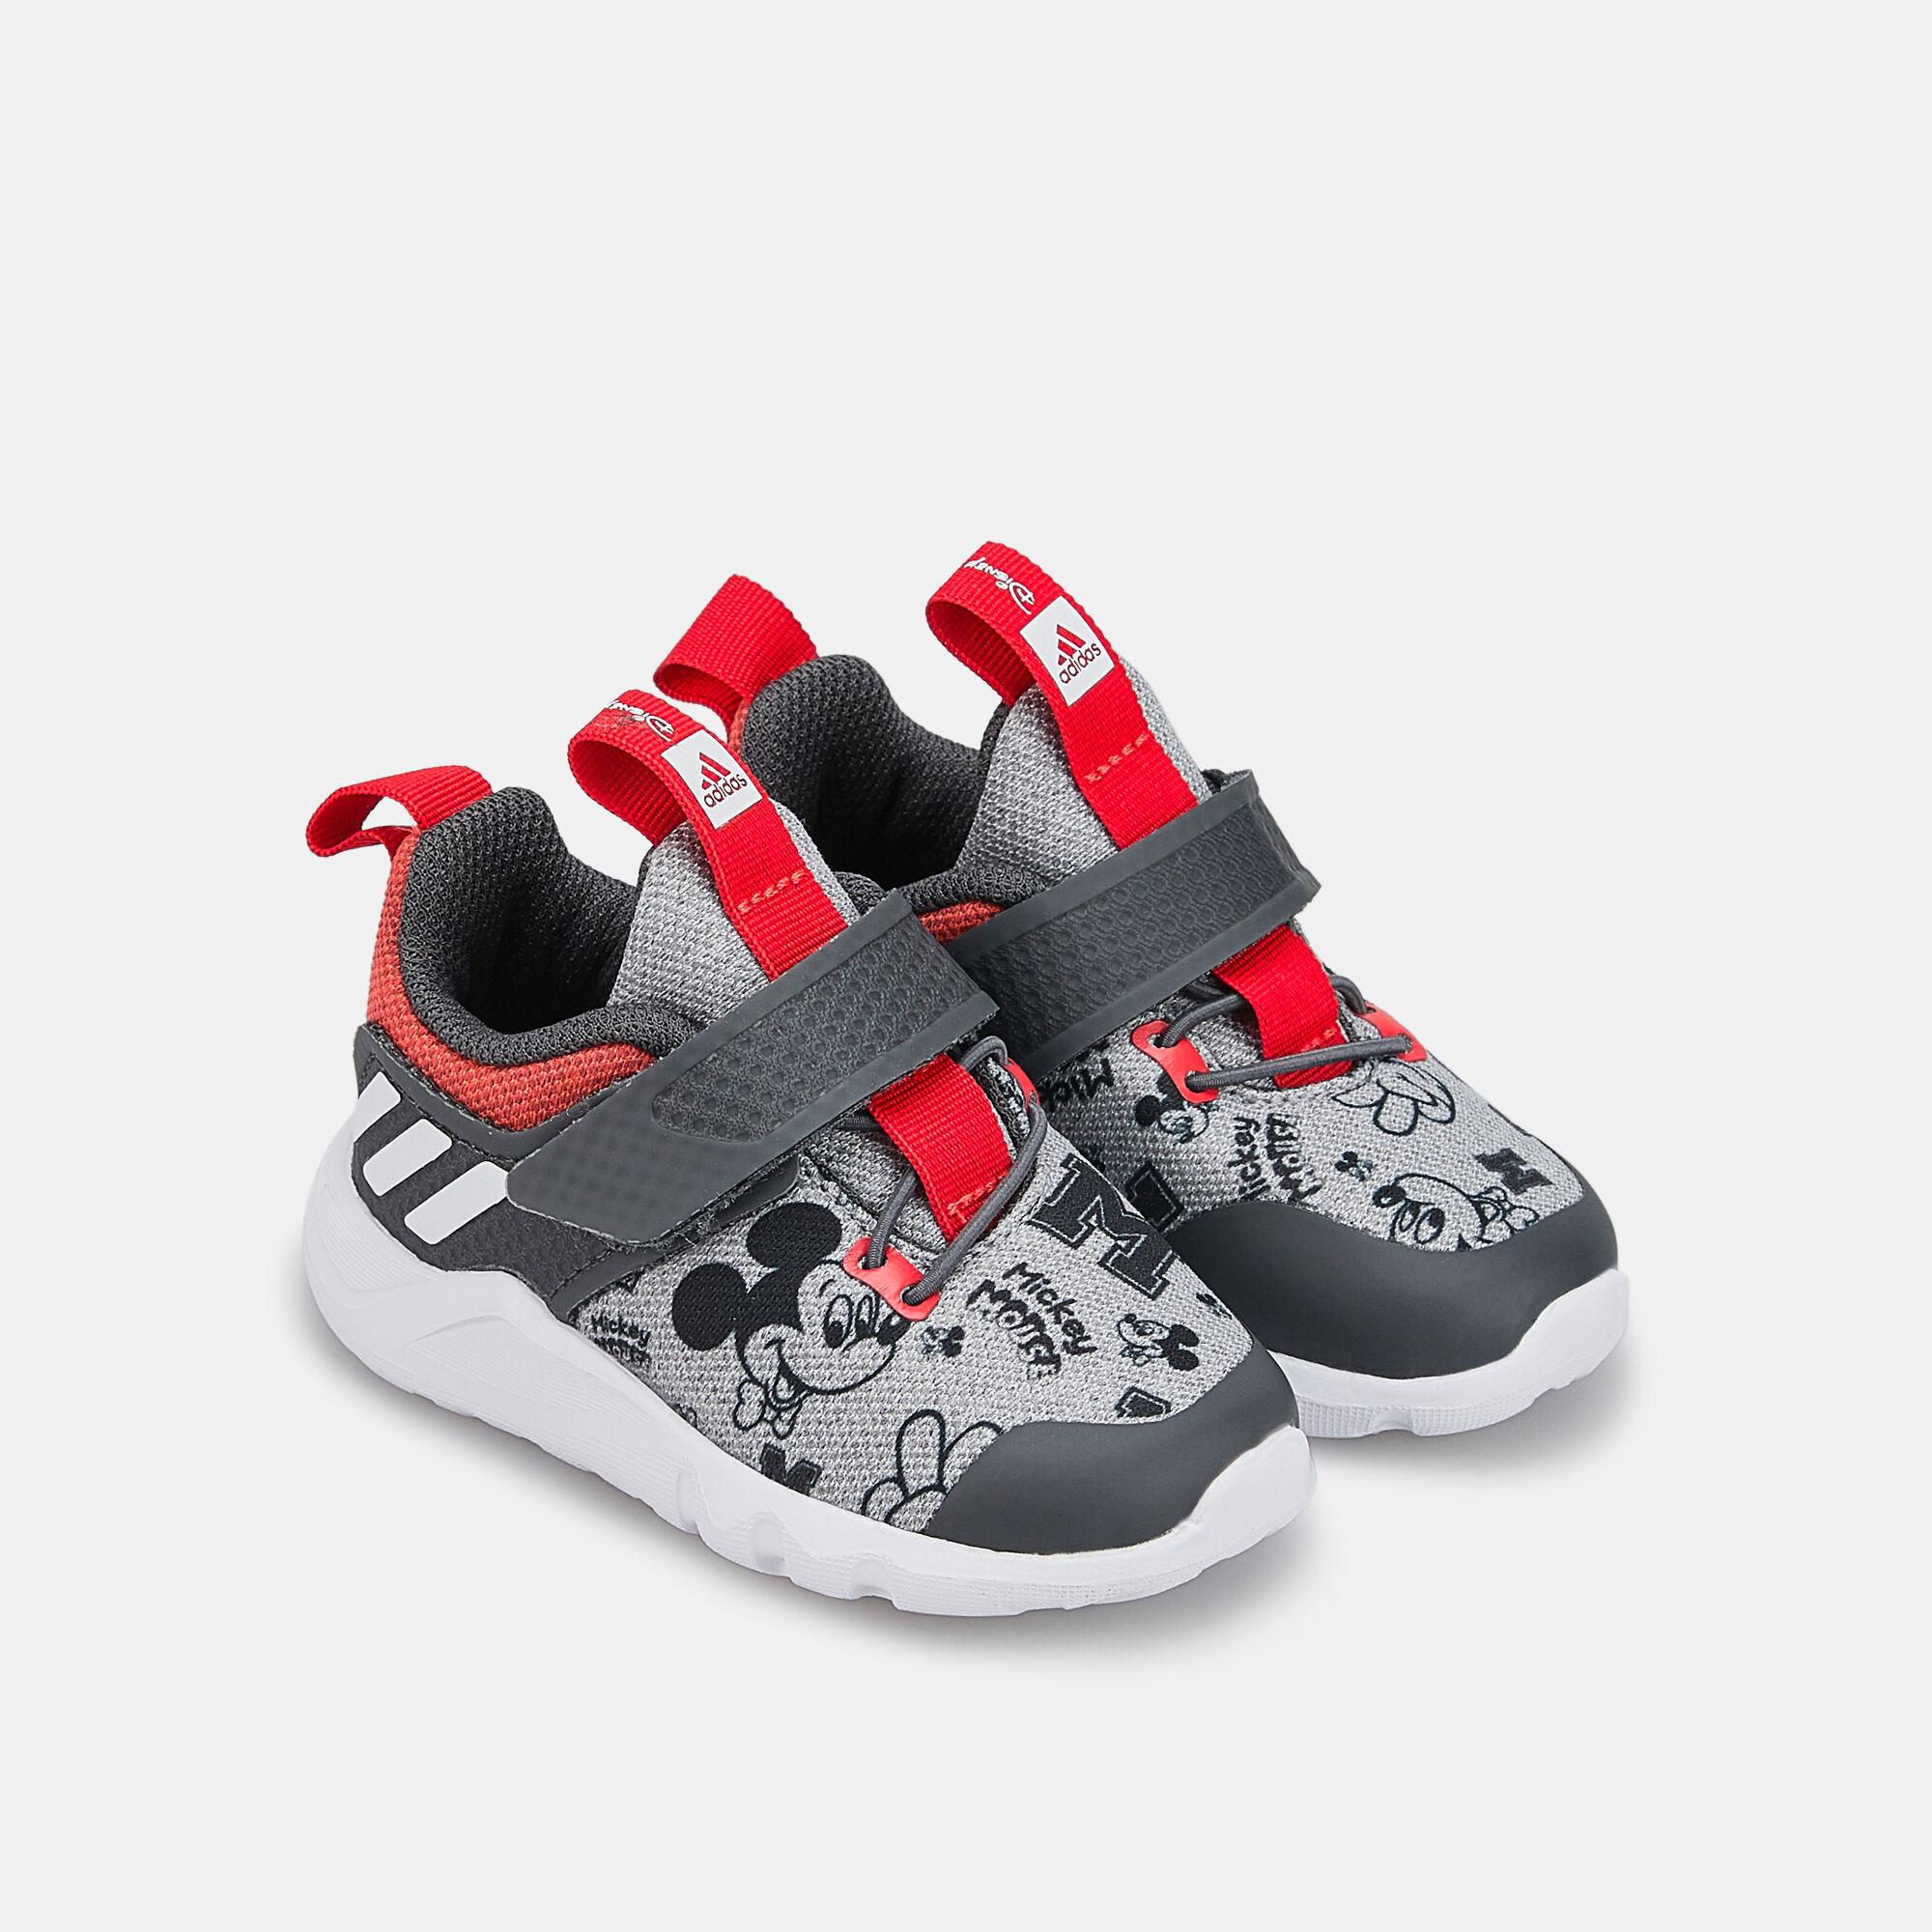 Buy adidas Kids' x Disney Mickey Mouse